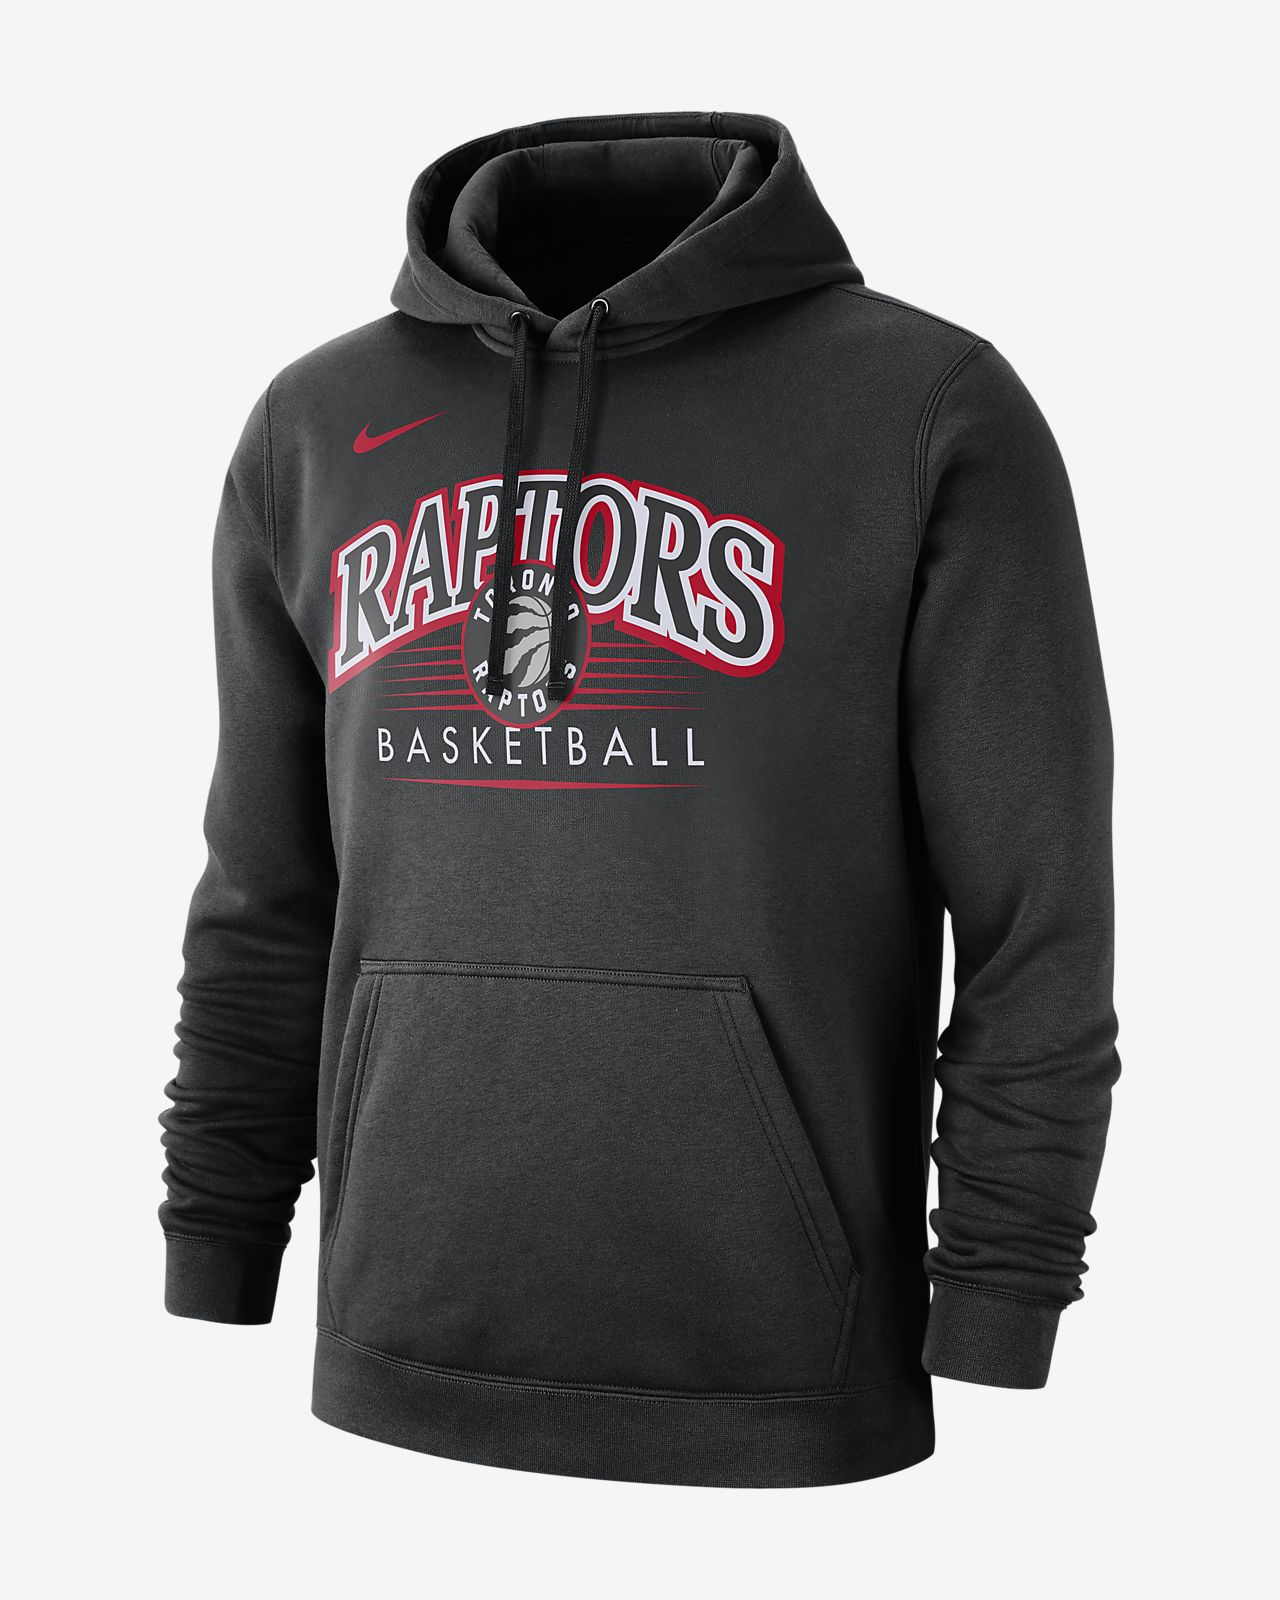 Felpa Toronto Raptors con cappuccio Nike NBA - Uomo